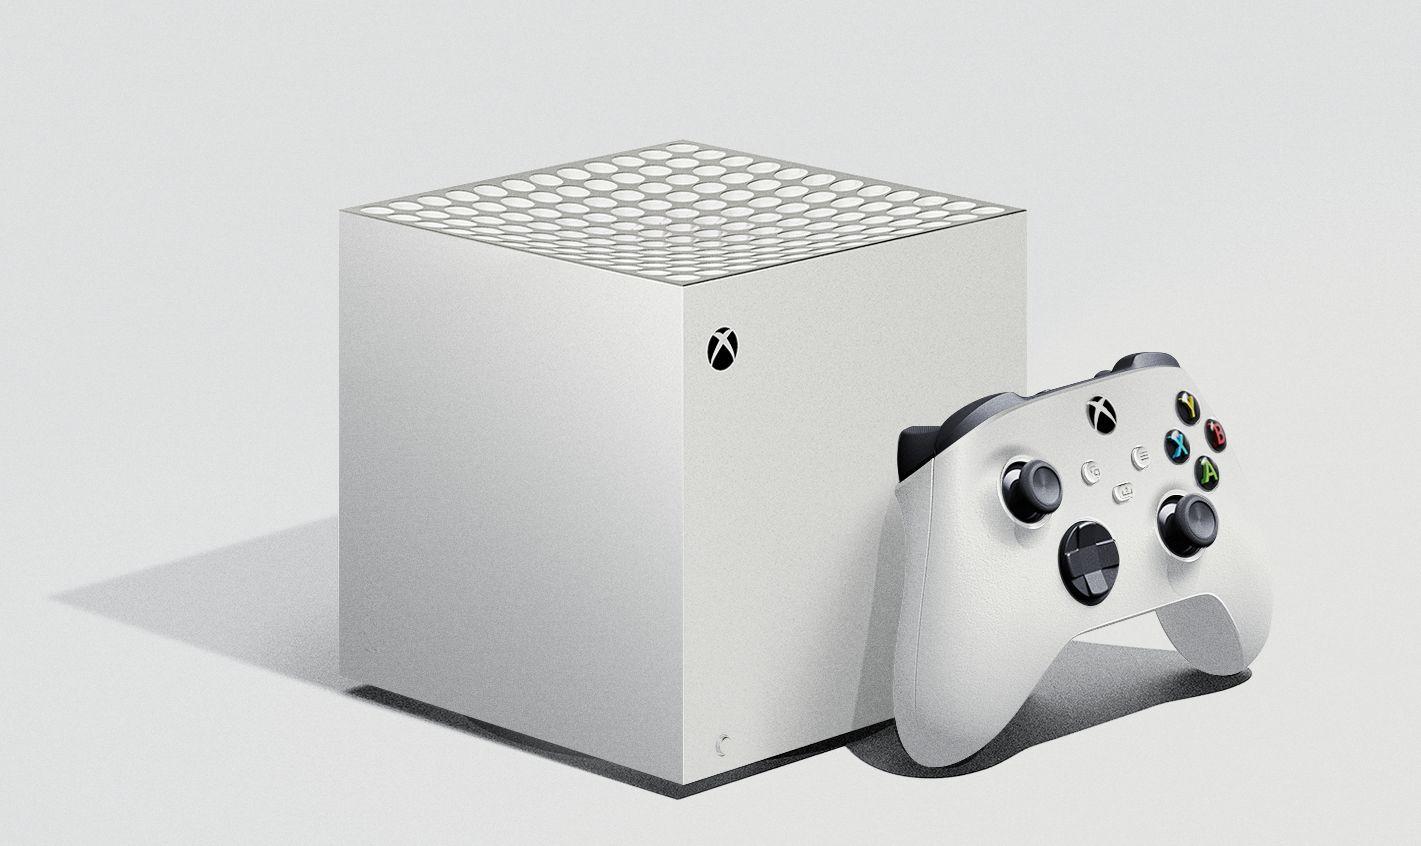 Xbox Series S Lockhart fan image